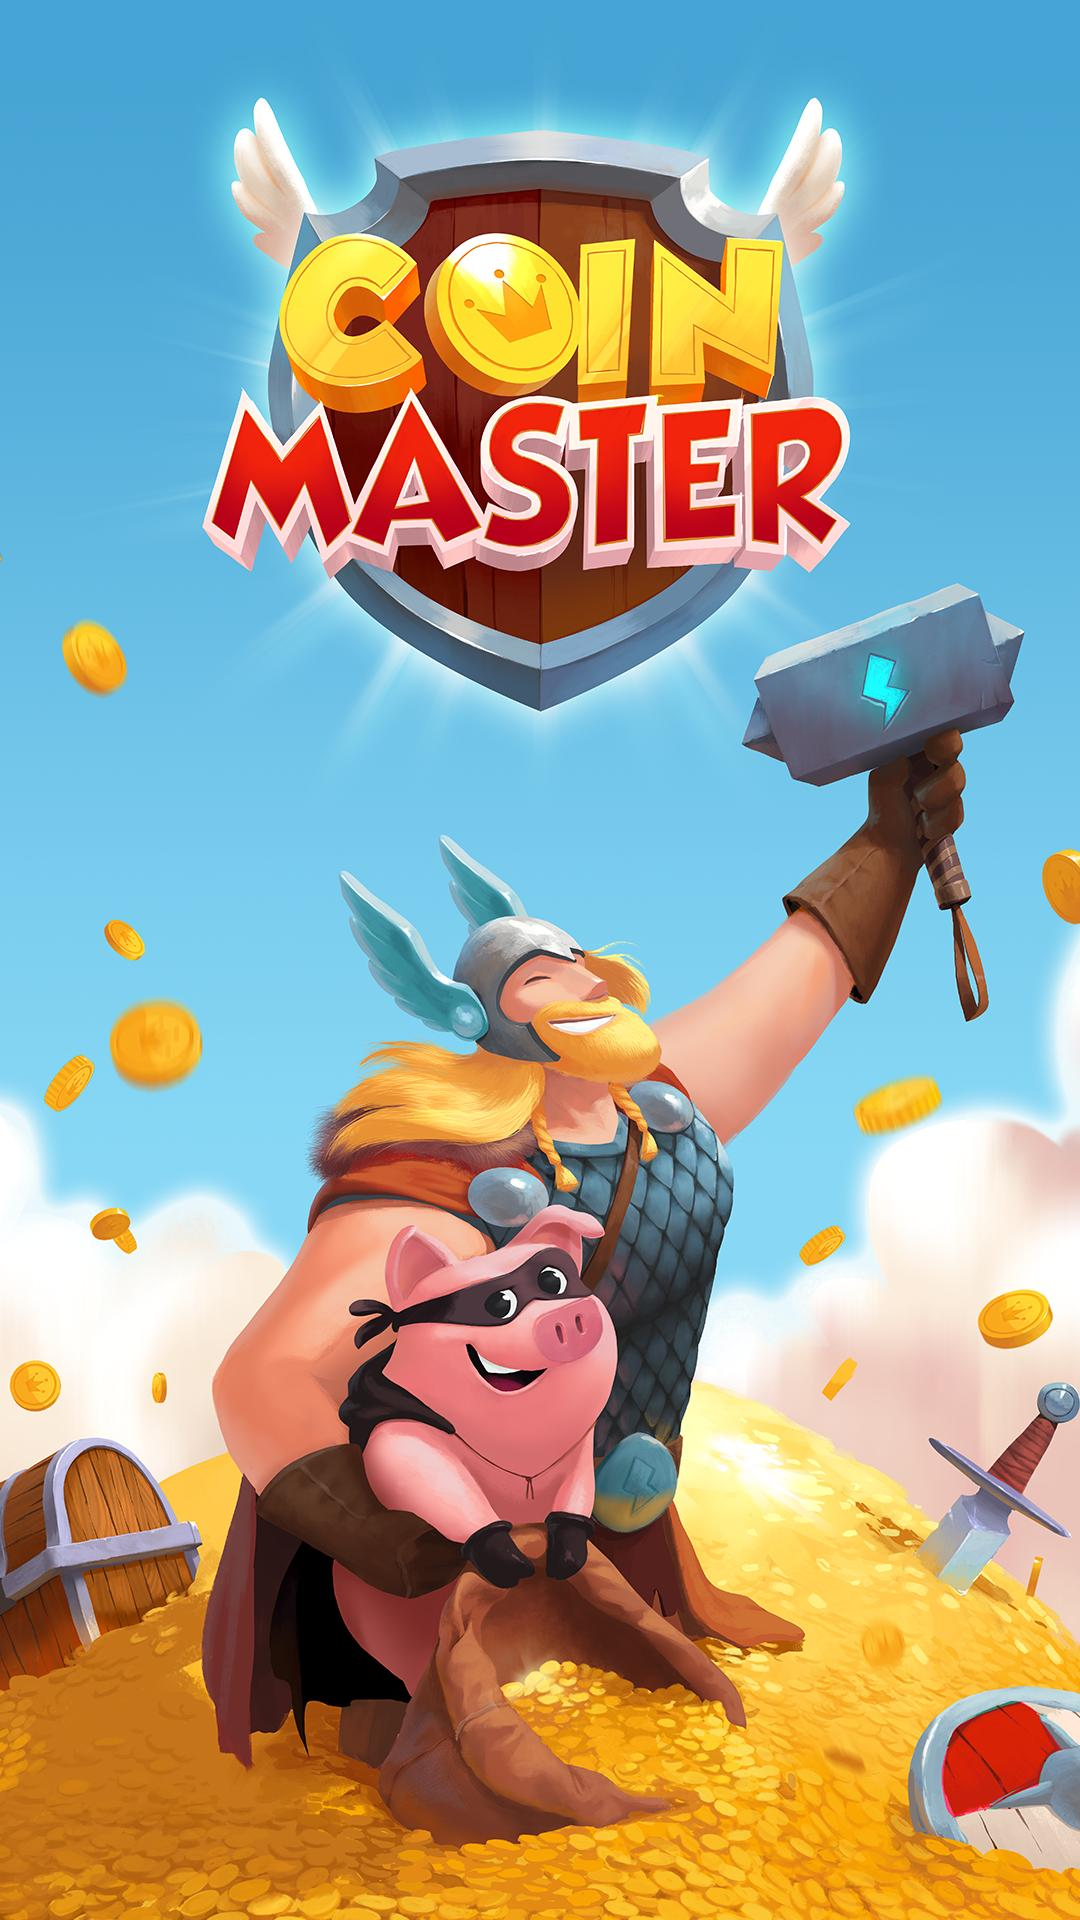 Coin Master 3.5.180 Screenshot 1